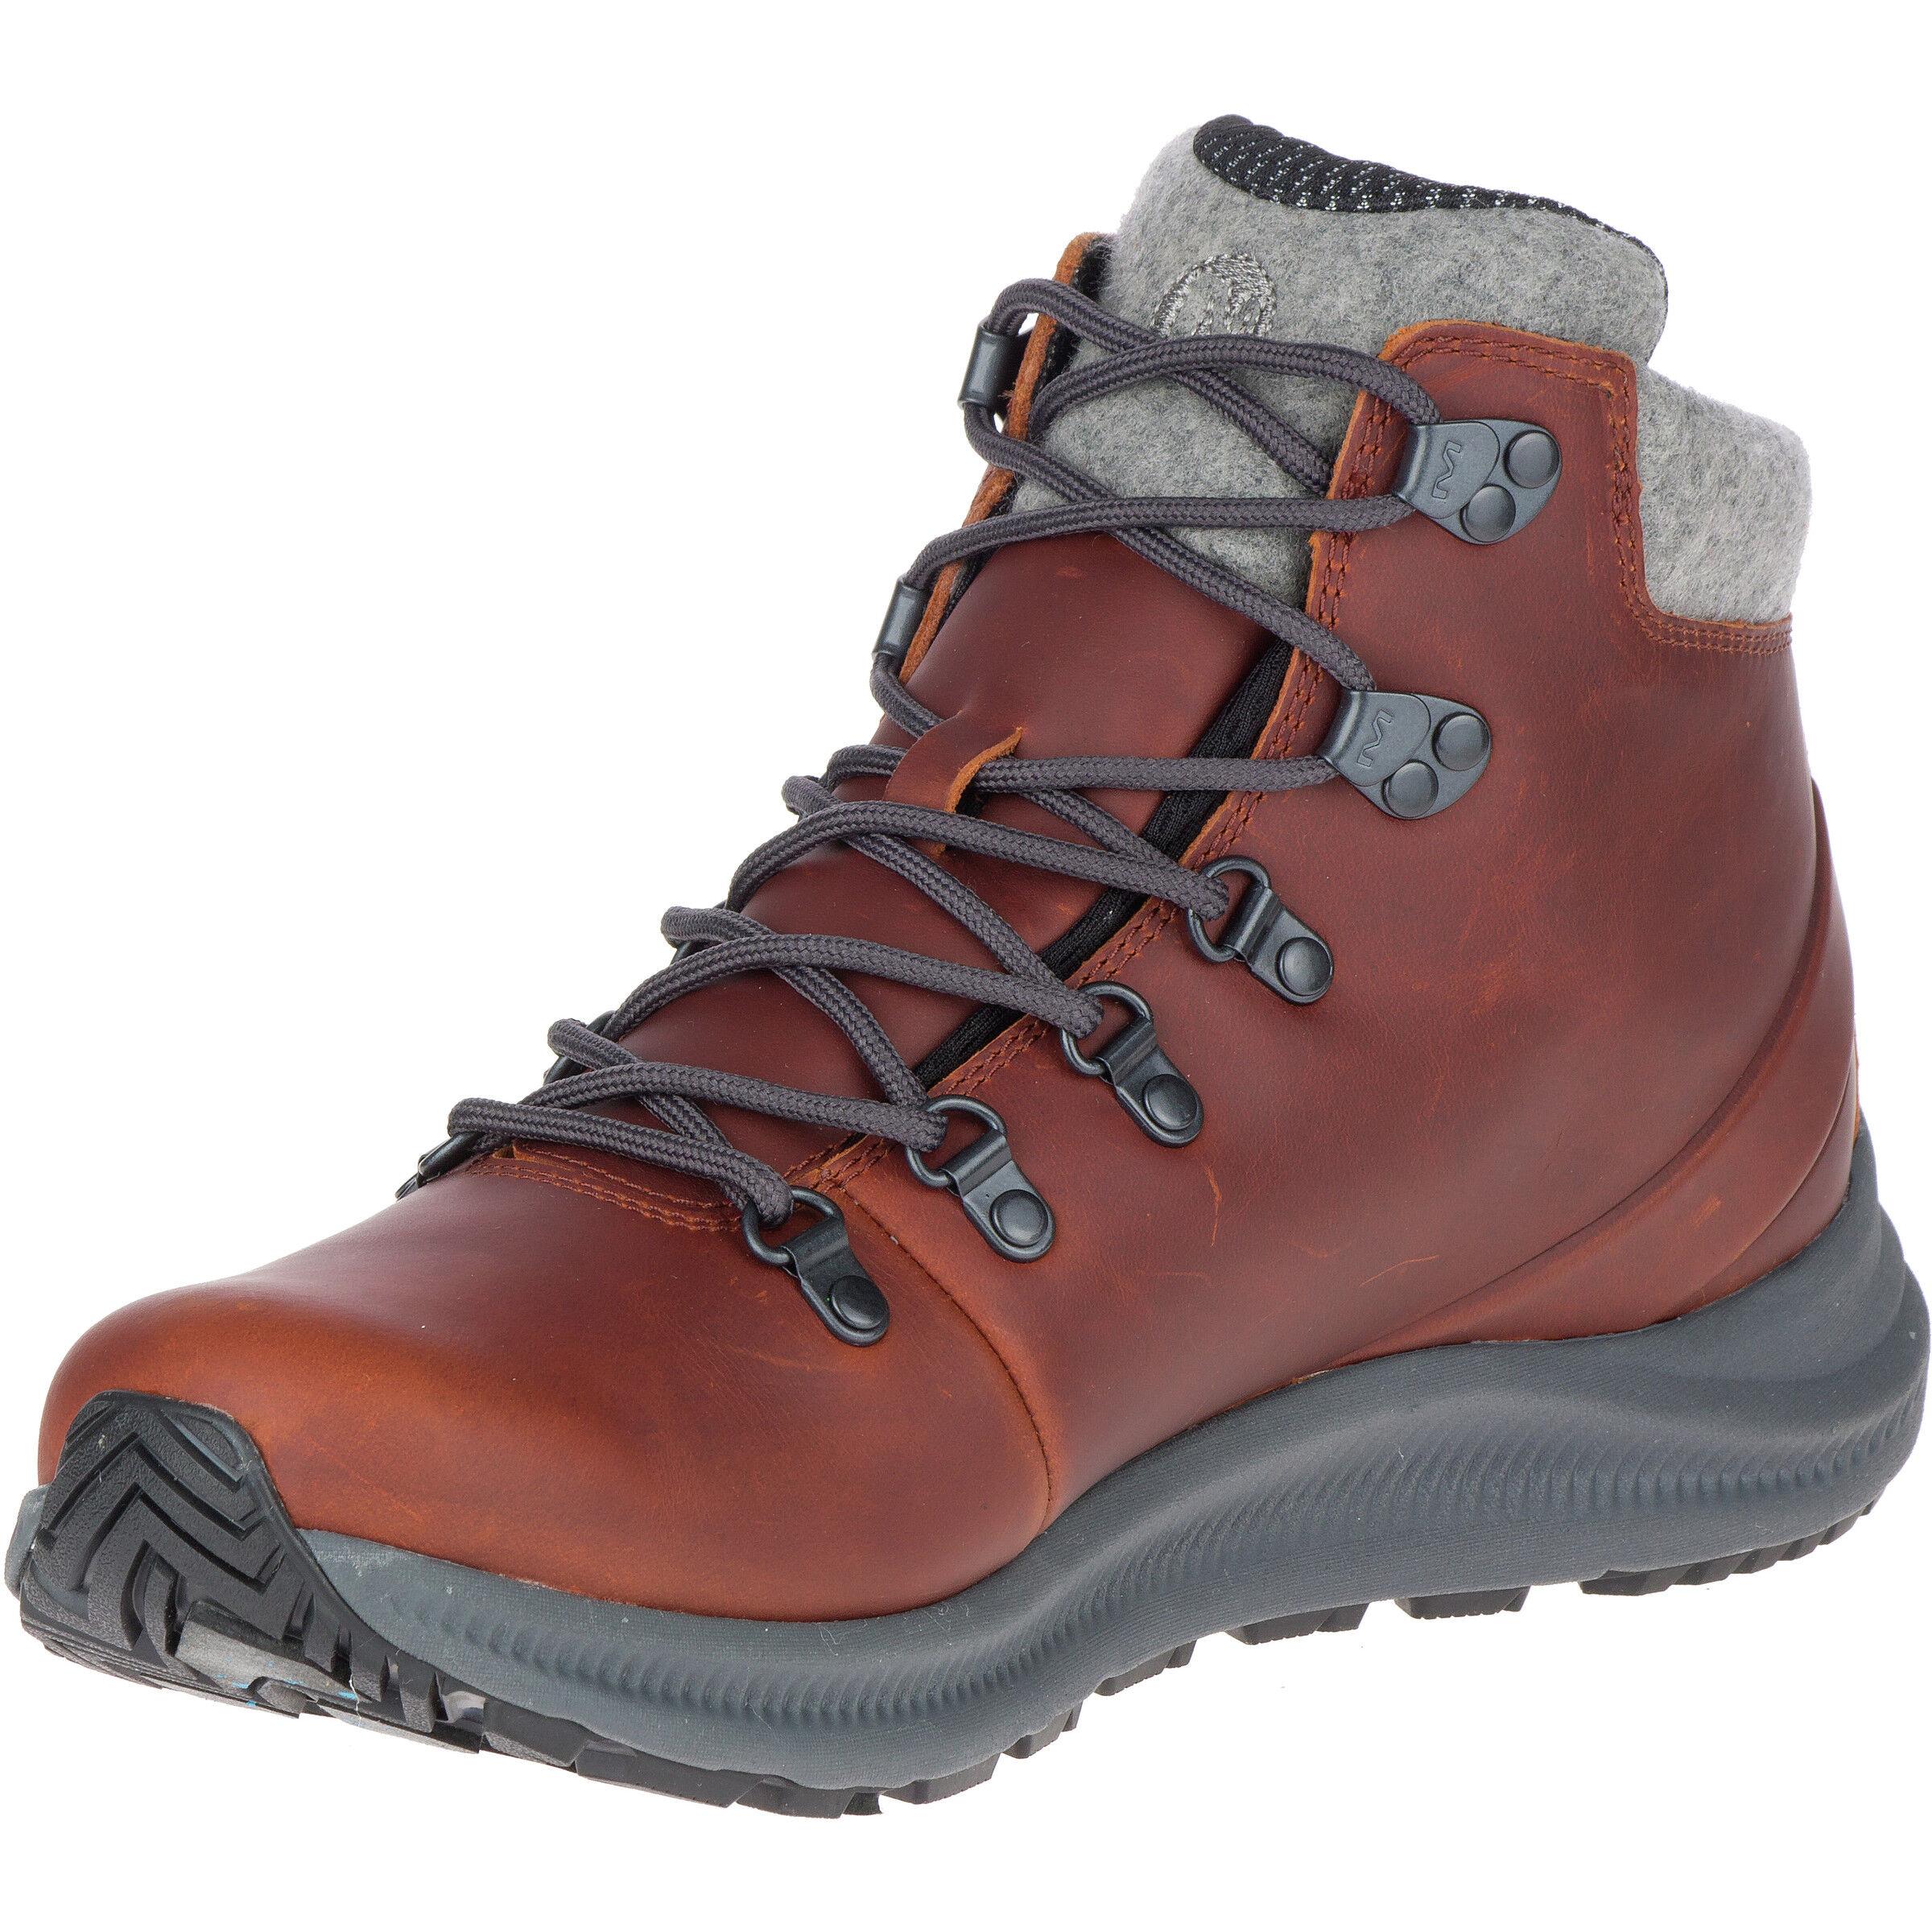 barley Thermo Herren Merrell WP Cut Schuhe Ontario Mid 8kX0nwZNOP